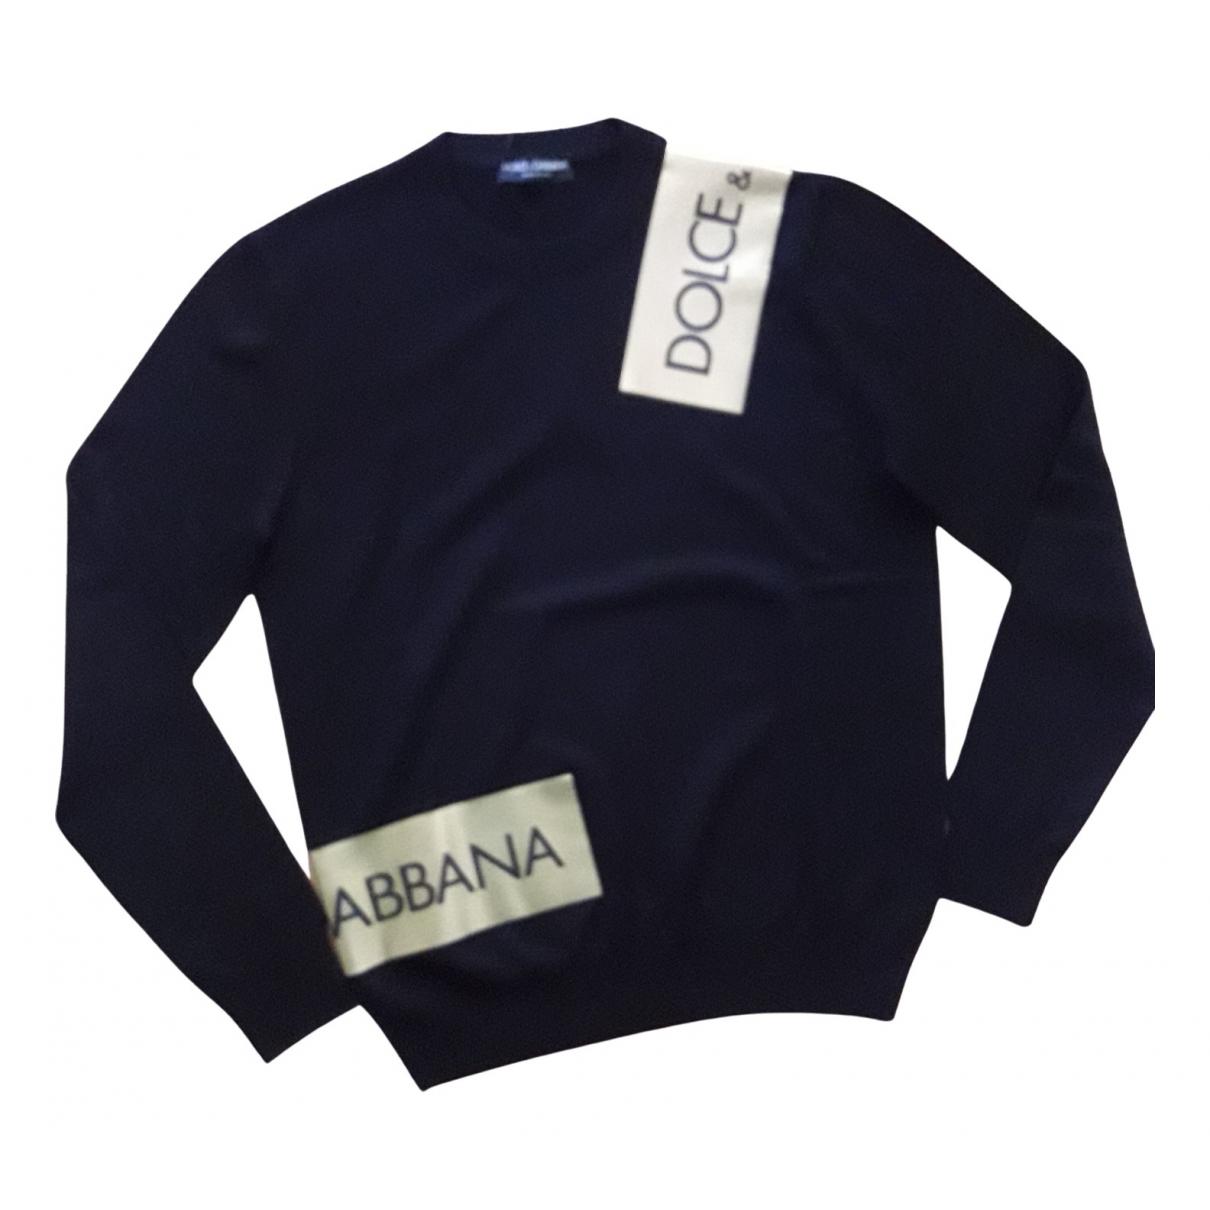 Jersey de Lana Dolce & Gabbana